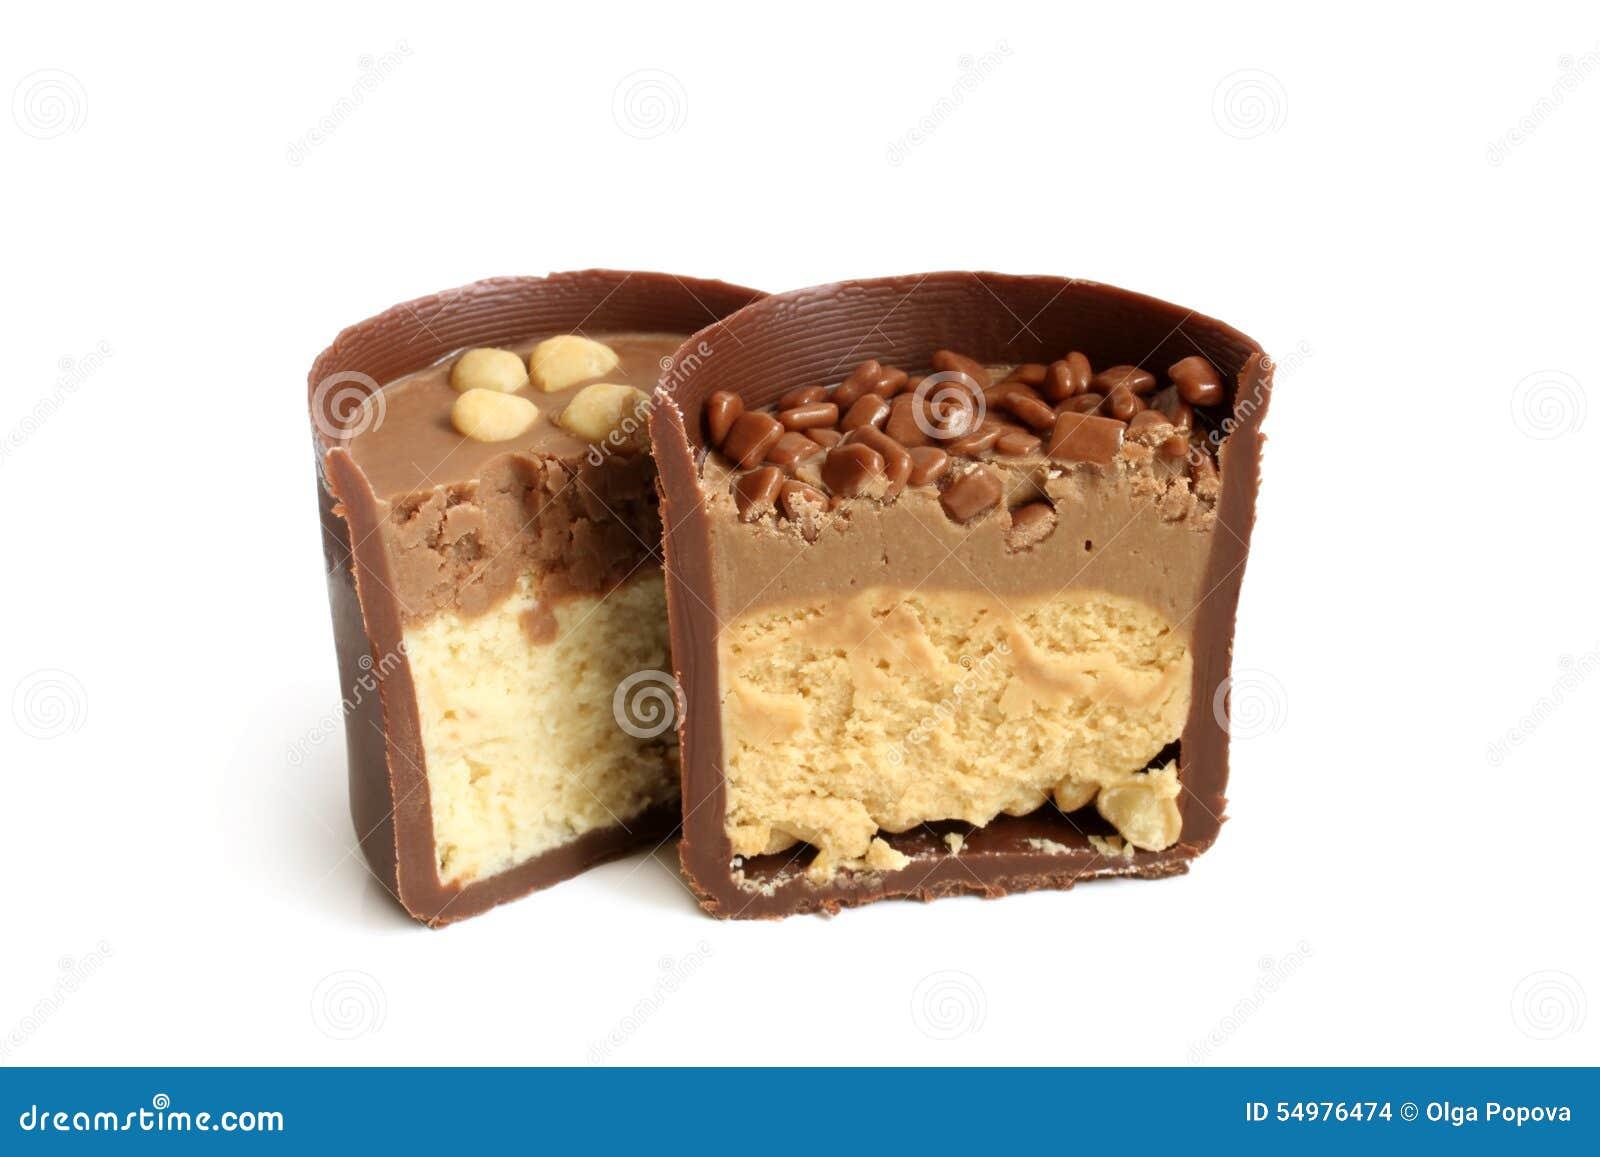 Schokolade sweet